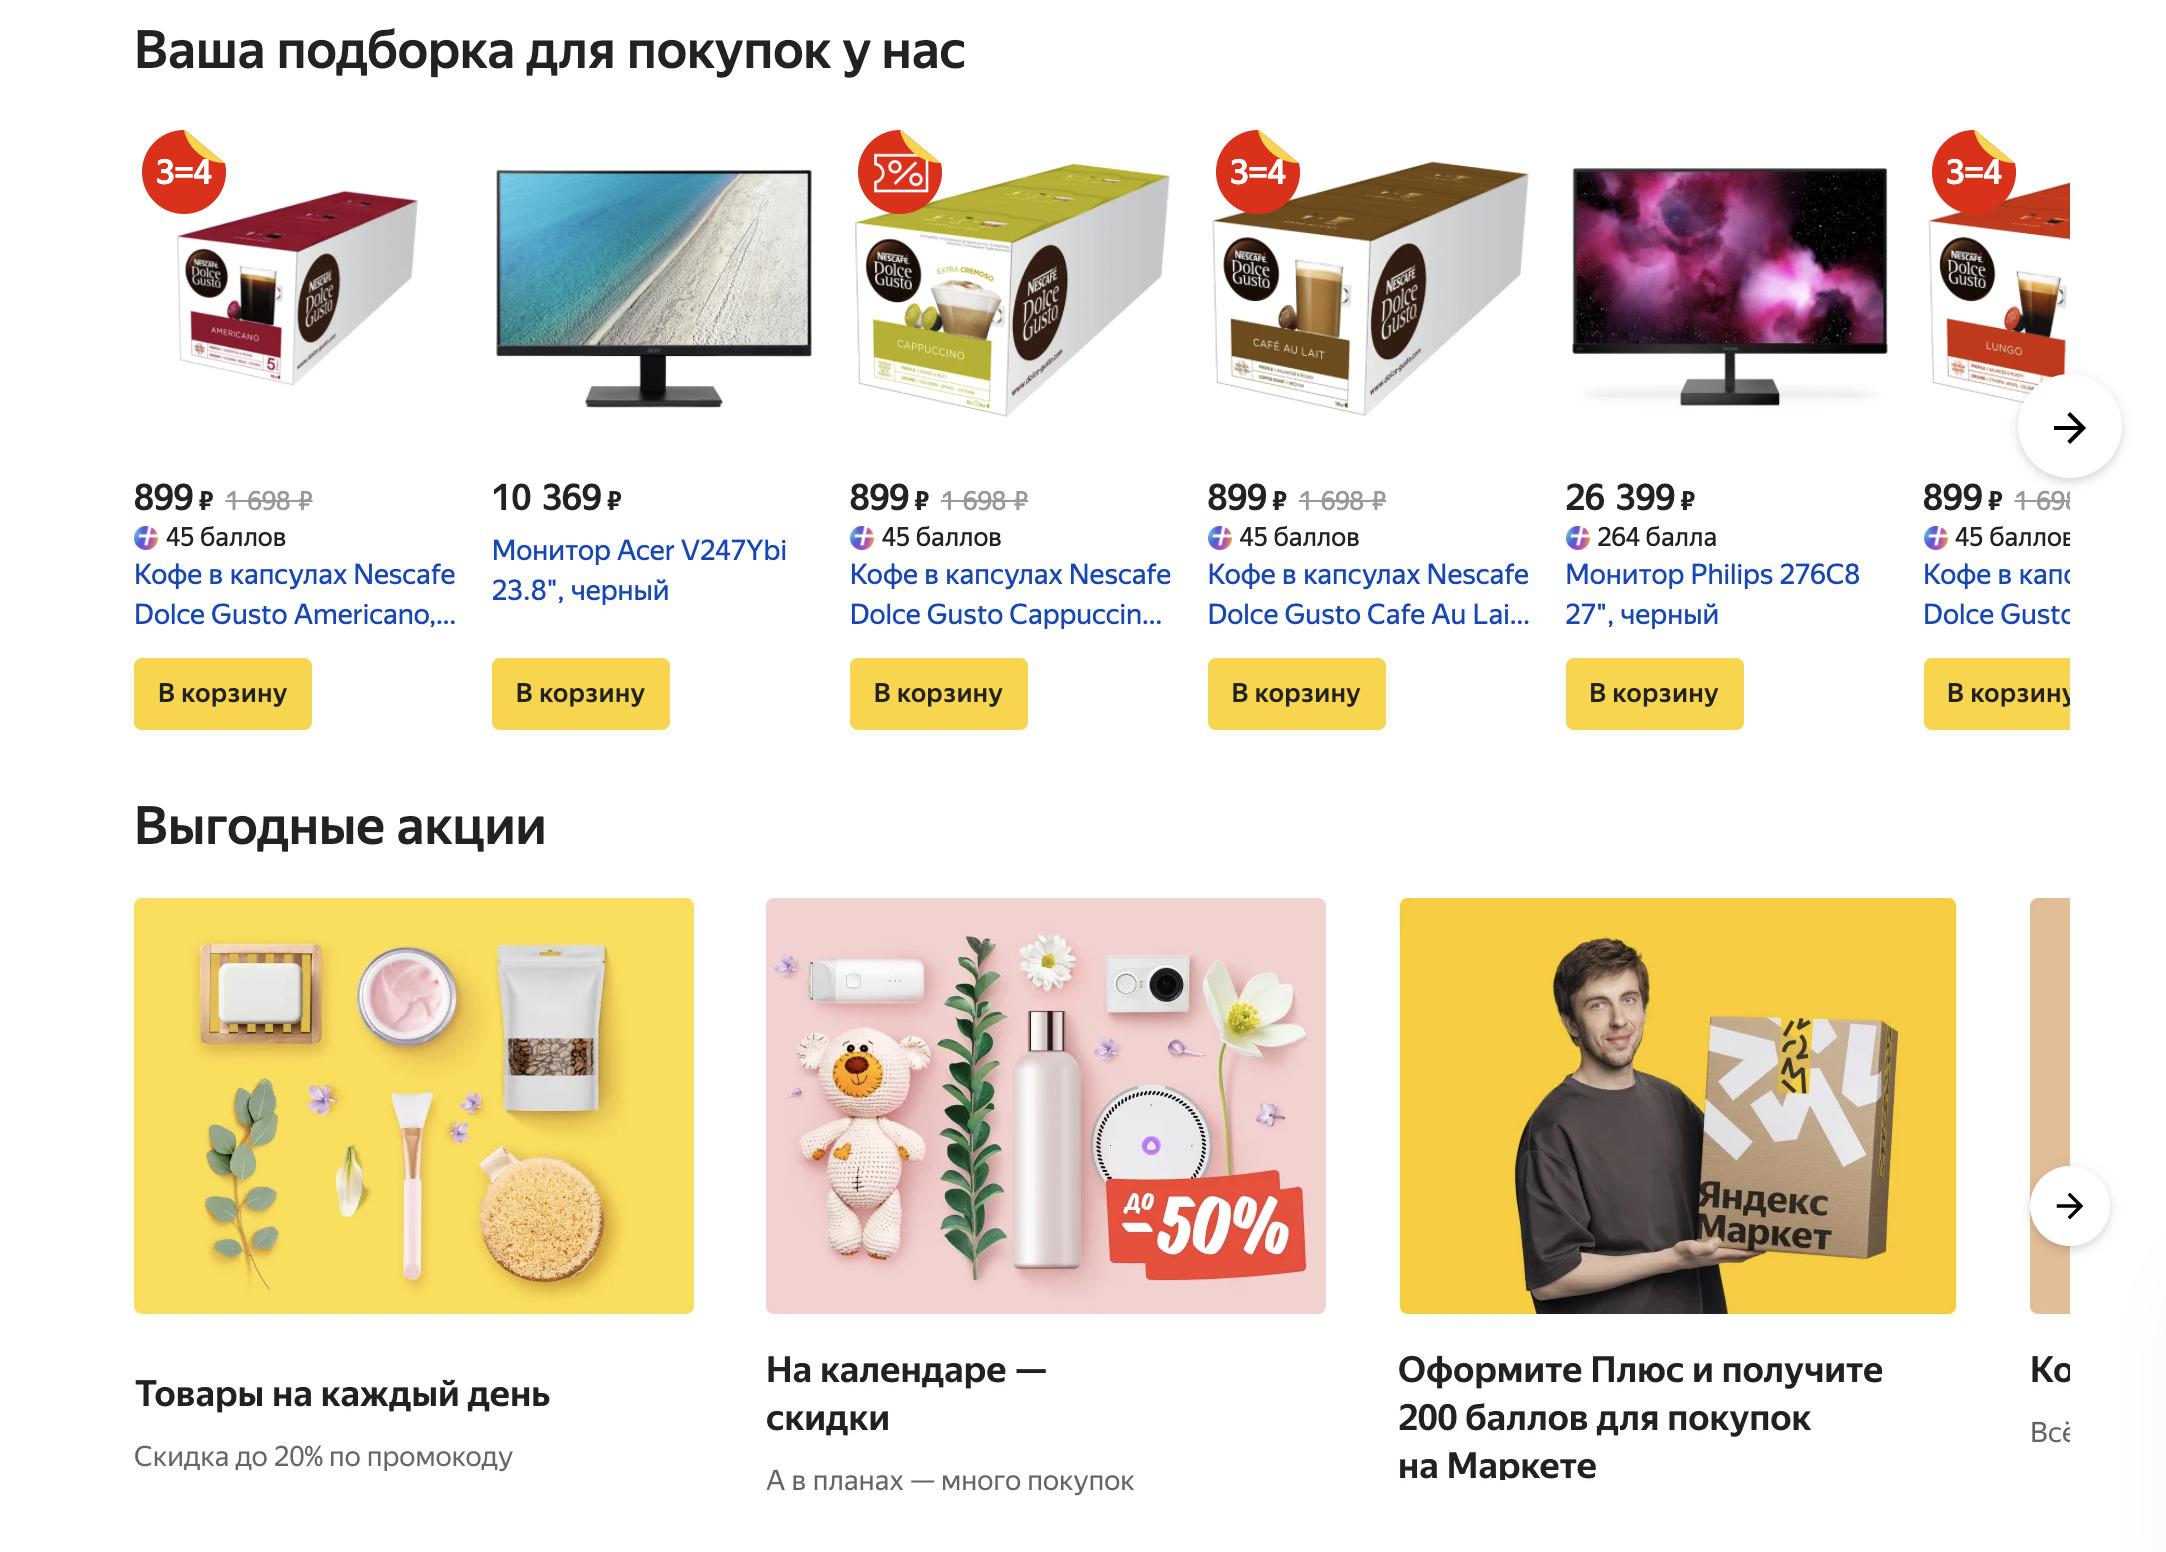 Доставка из Яндекс.Маркет в Арзамас, сроки, пункты выдачи, каталог